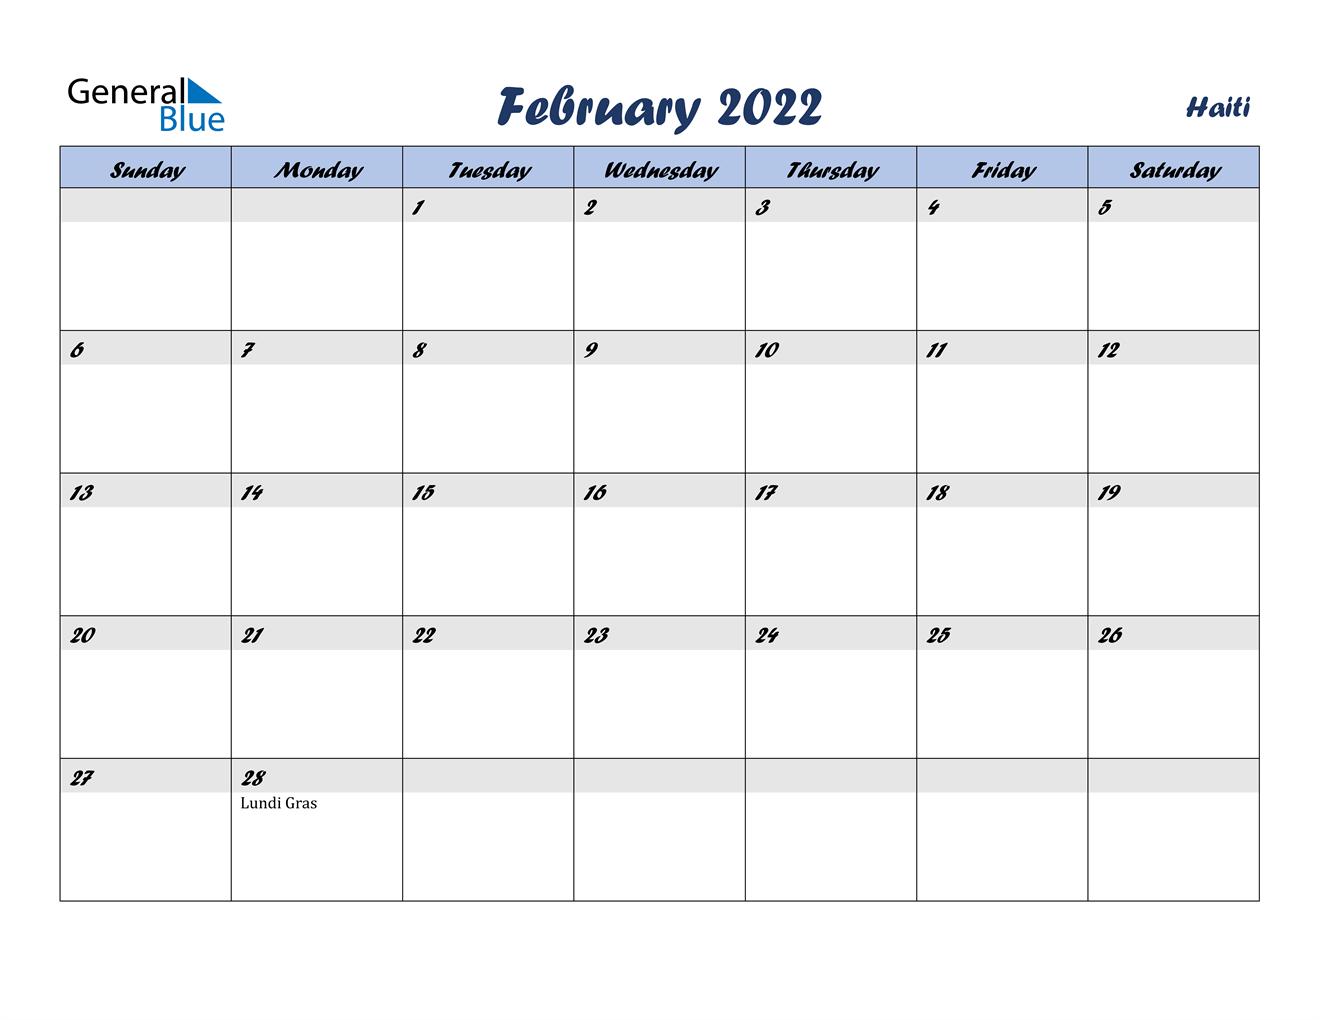 February 2022 Calendar - Haiti